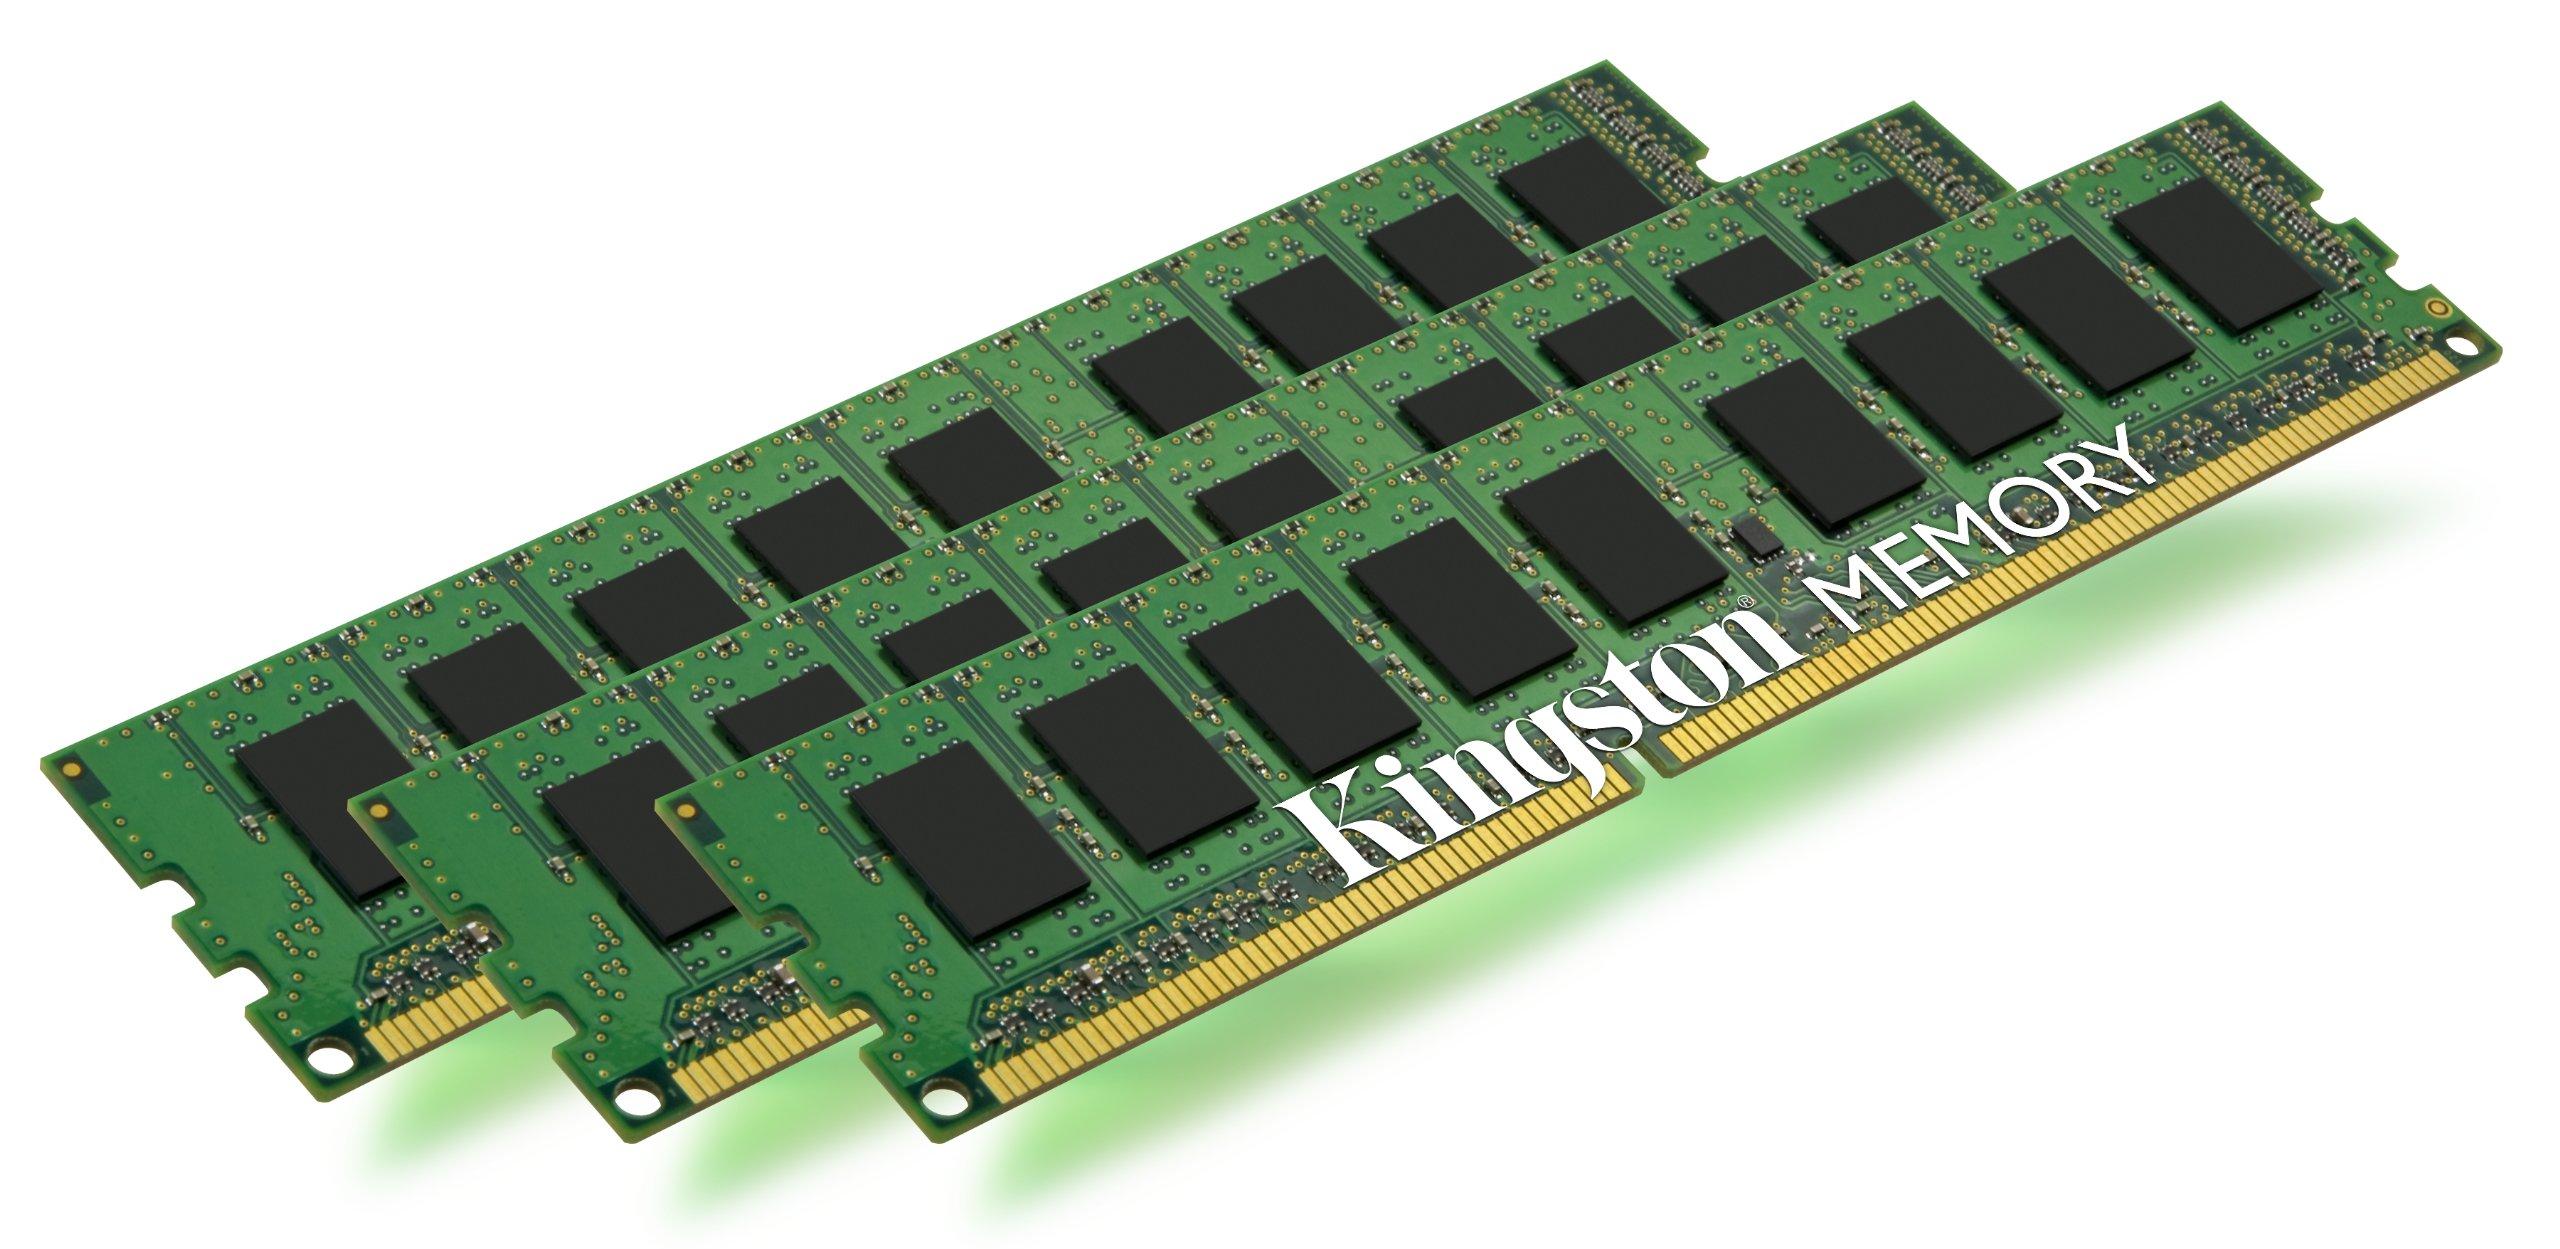 Memoria Ram 4gb 1x4gb Ddr3 1333mhz Pc3-10600 Kth-pl313e/4g